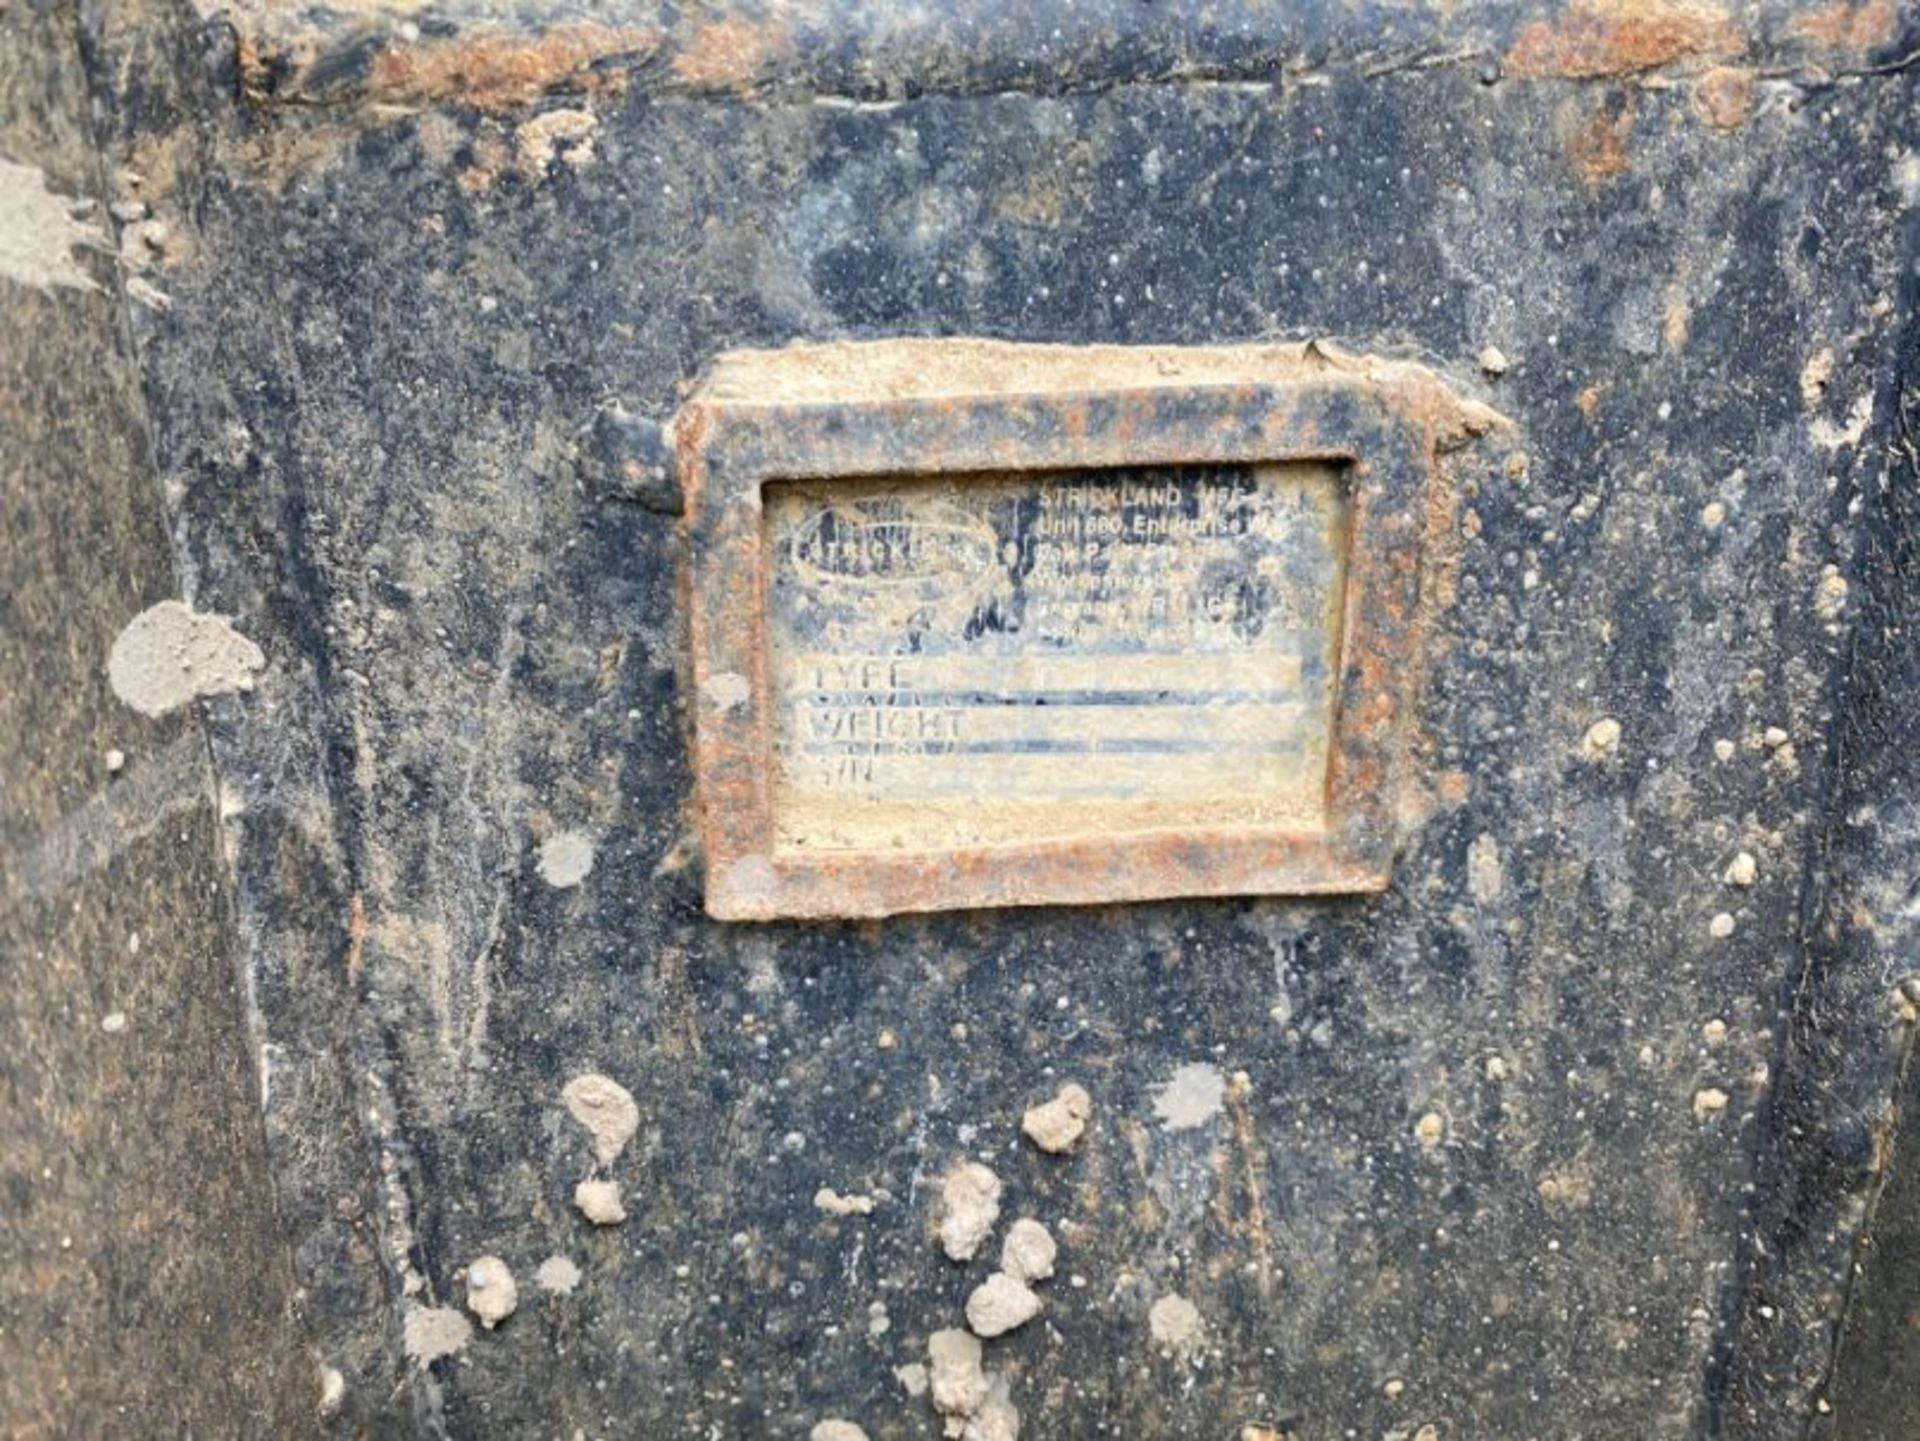 "Lot 43 - Strickland 30"" excavator bucket (no age ID): 2"" dia pin x 6.5"" dipper x 12"" between centres"